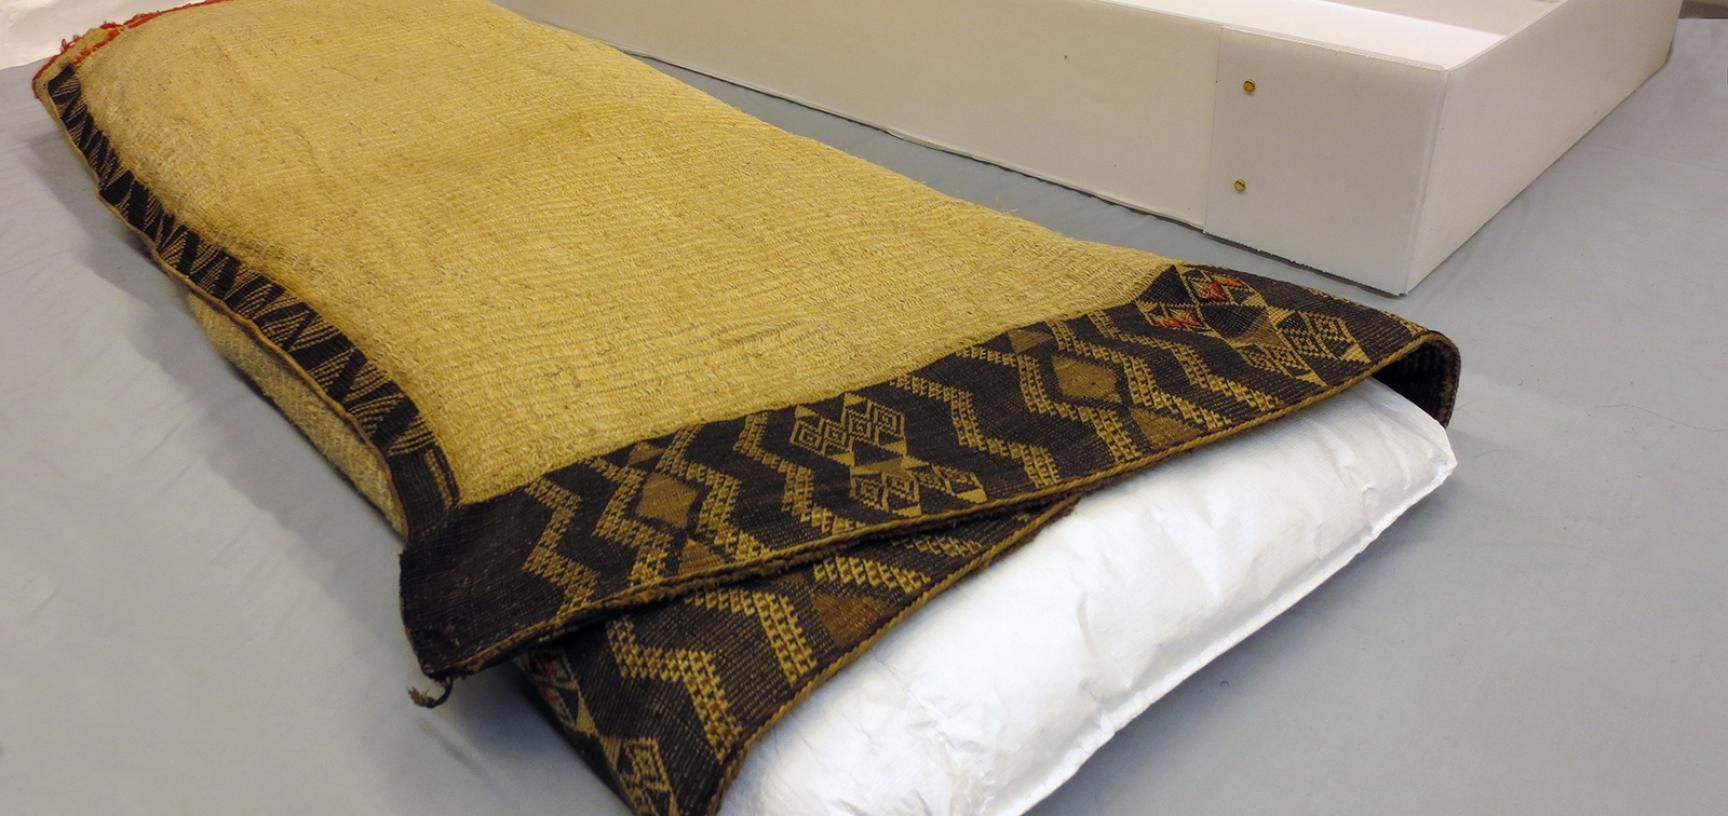 Cloak (1923.87.162) folded for storage